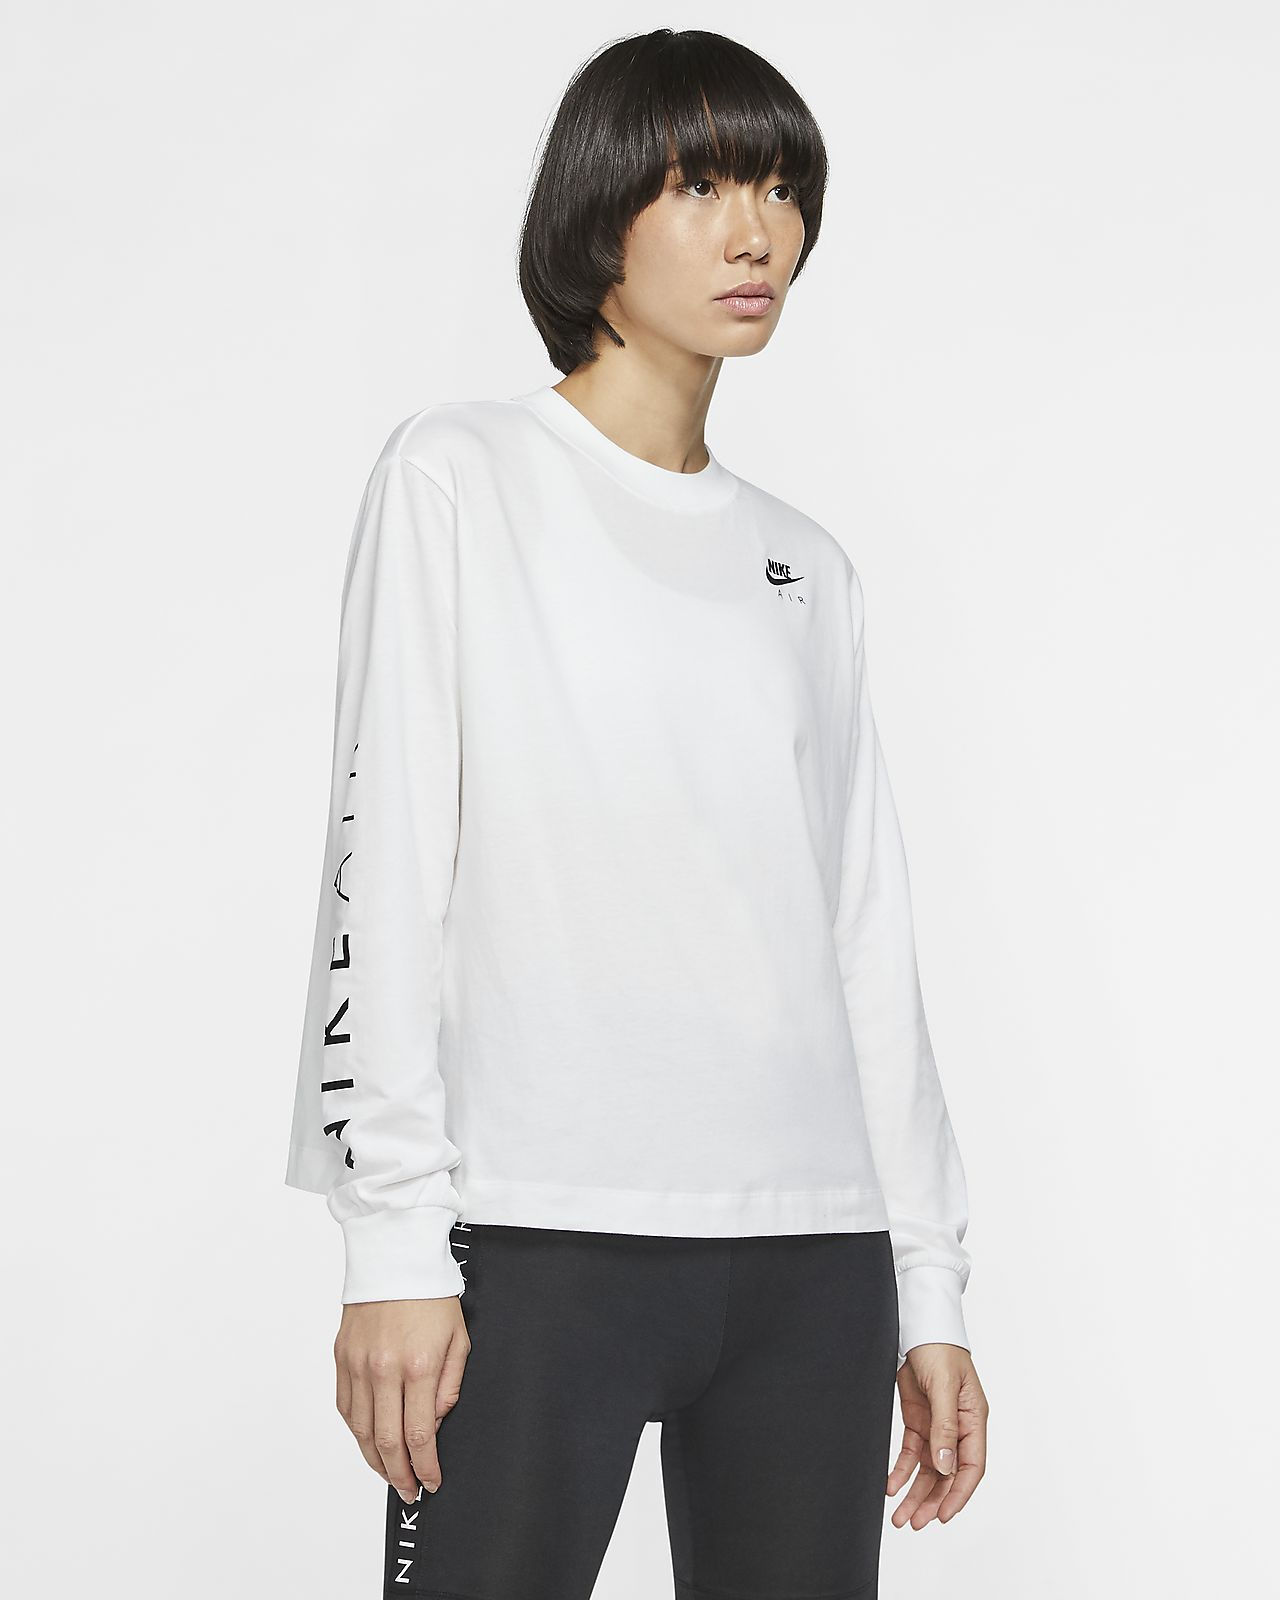 Dámský top Nike Air s dlouhým rukávem